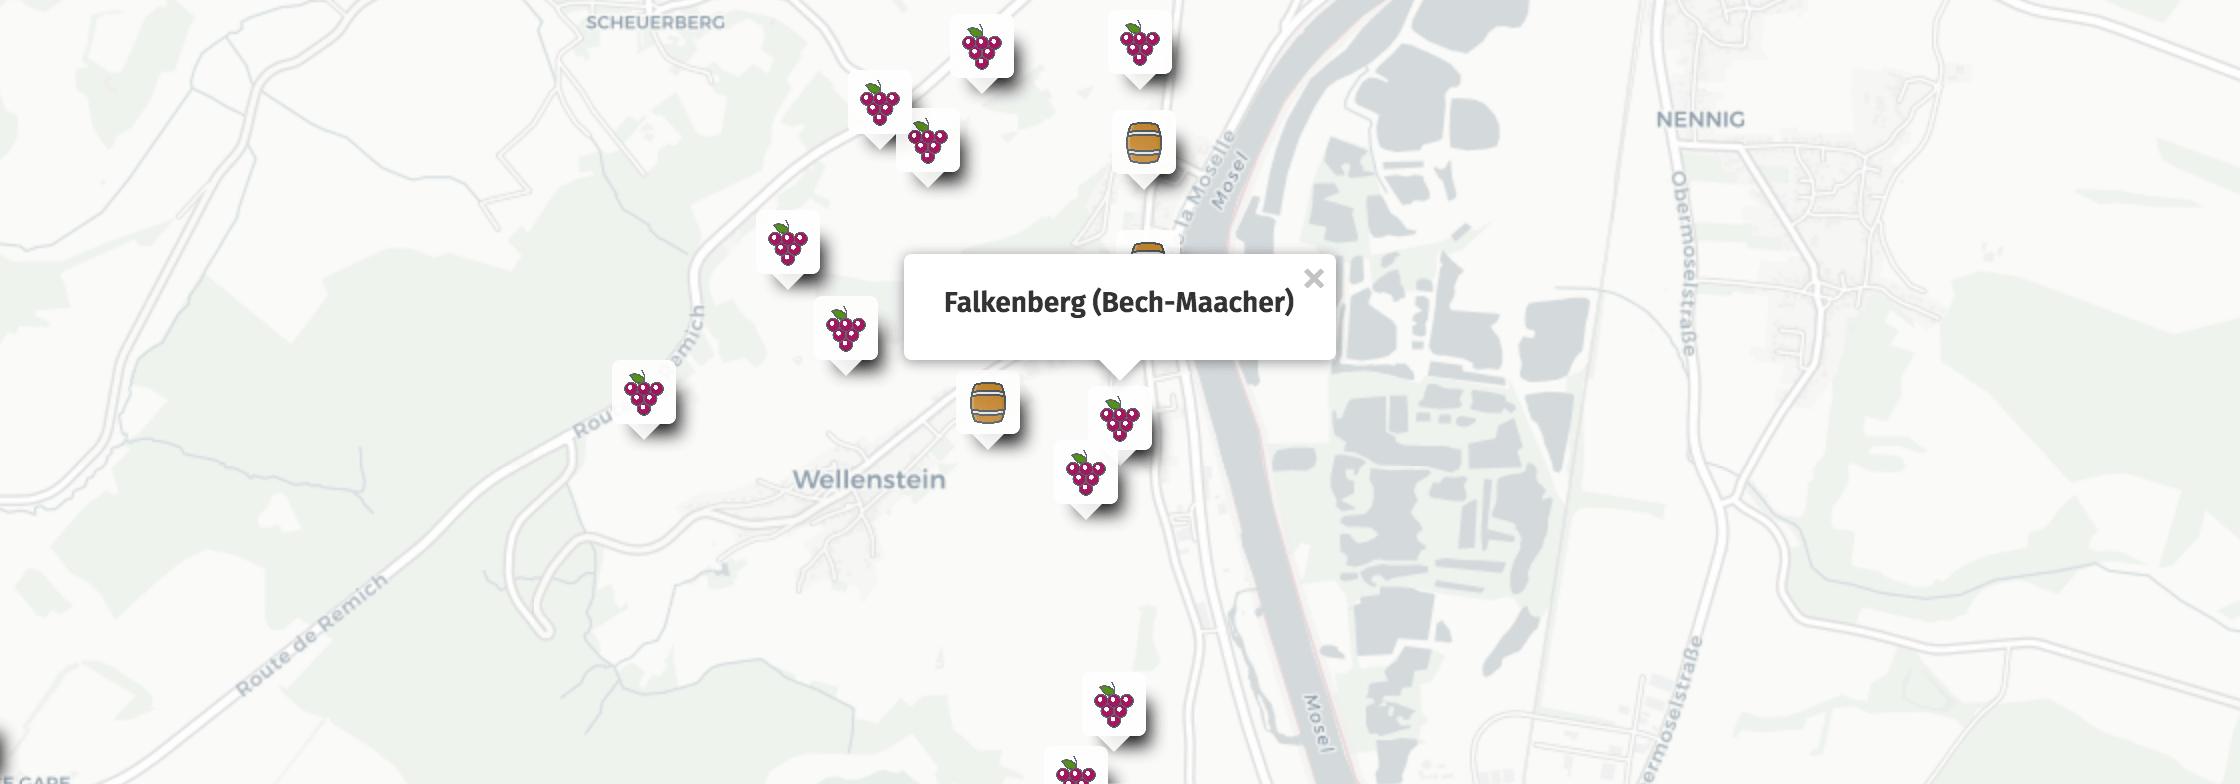 Geolocalisation des vins du Falkenberg à Bech-Kleinmacher